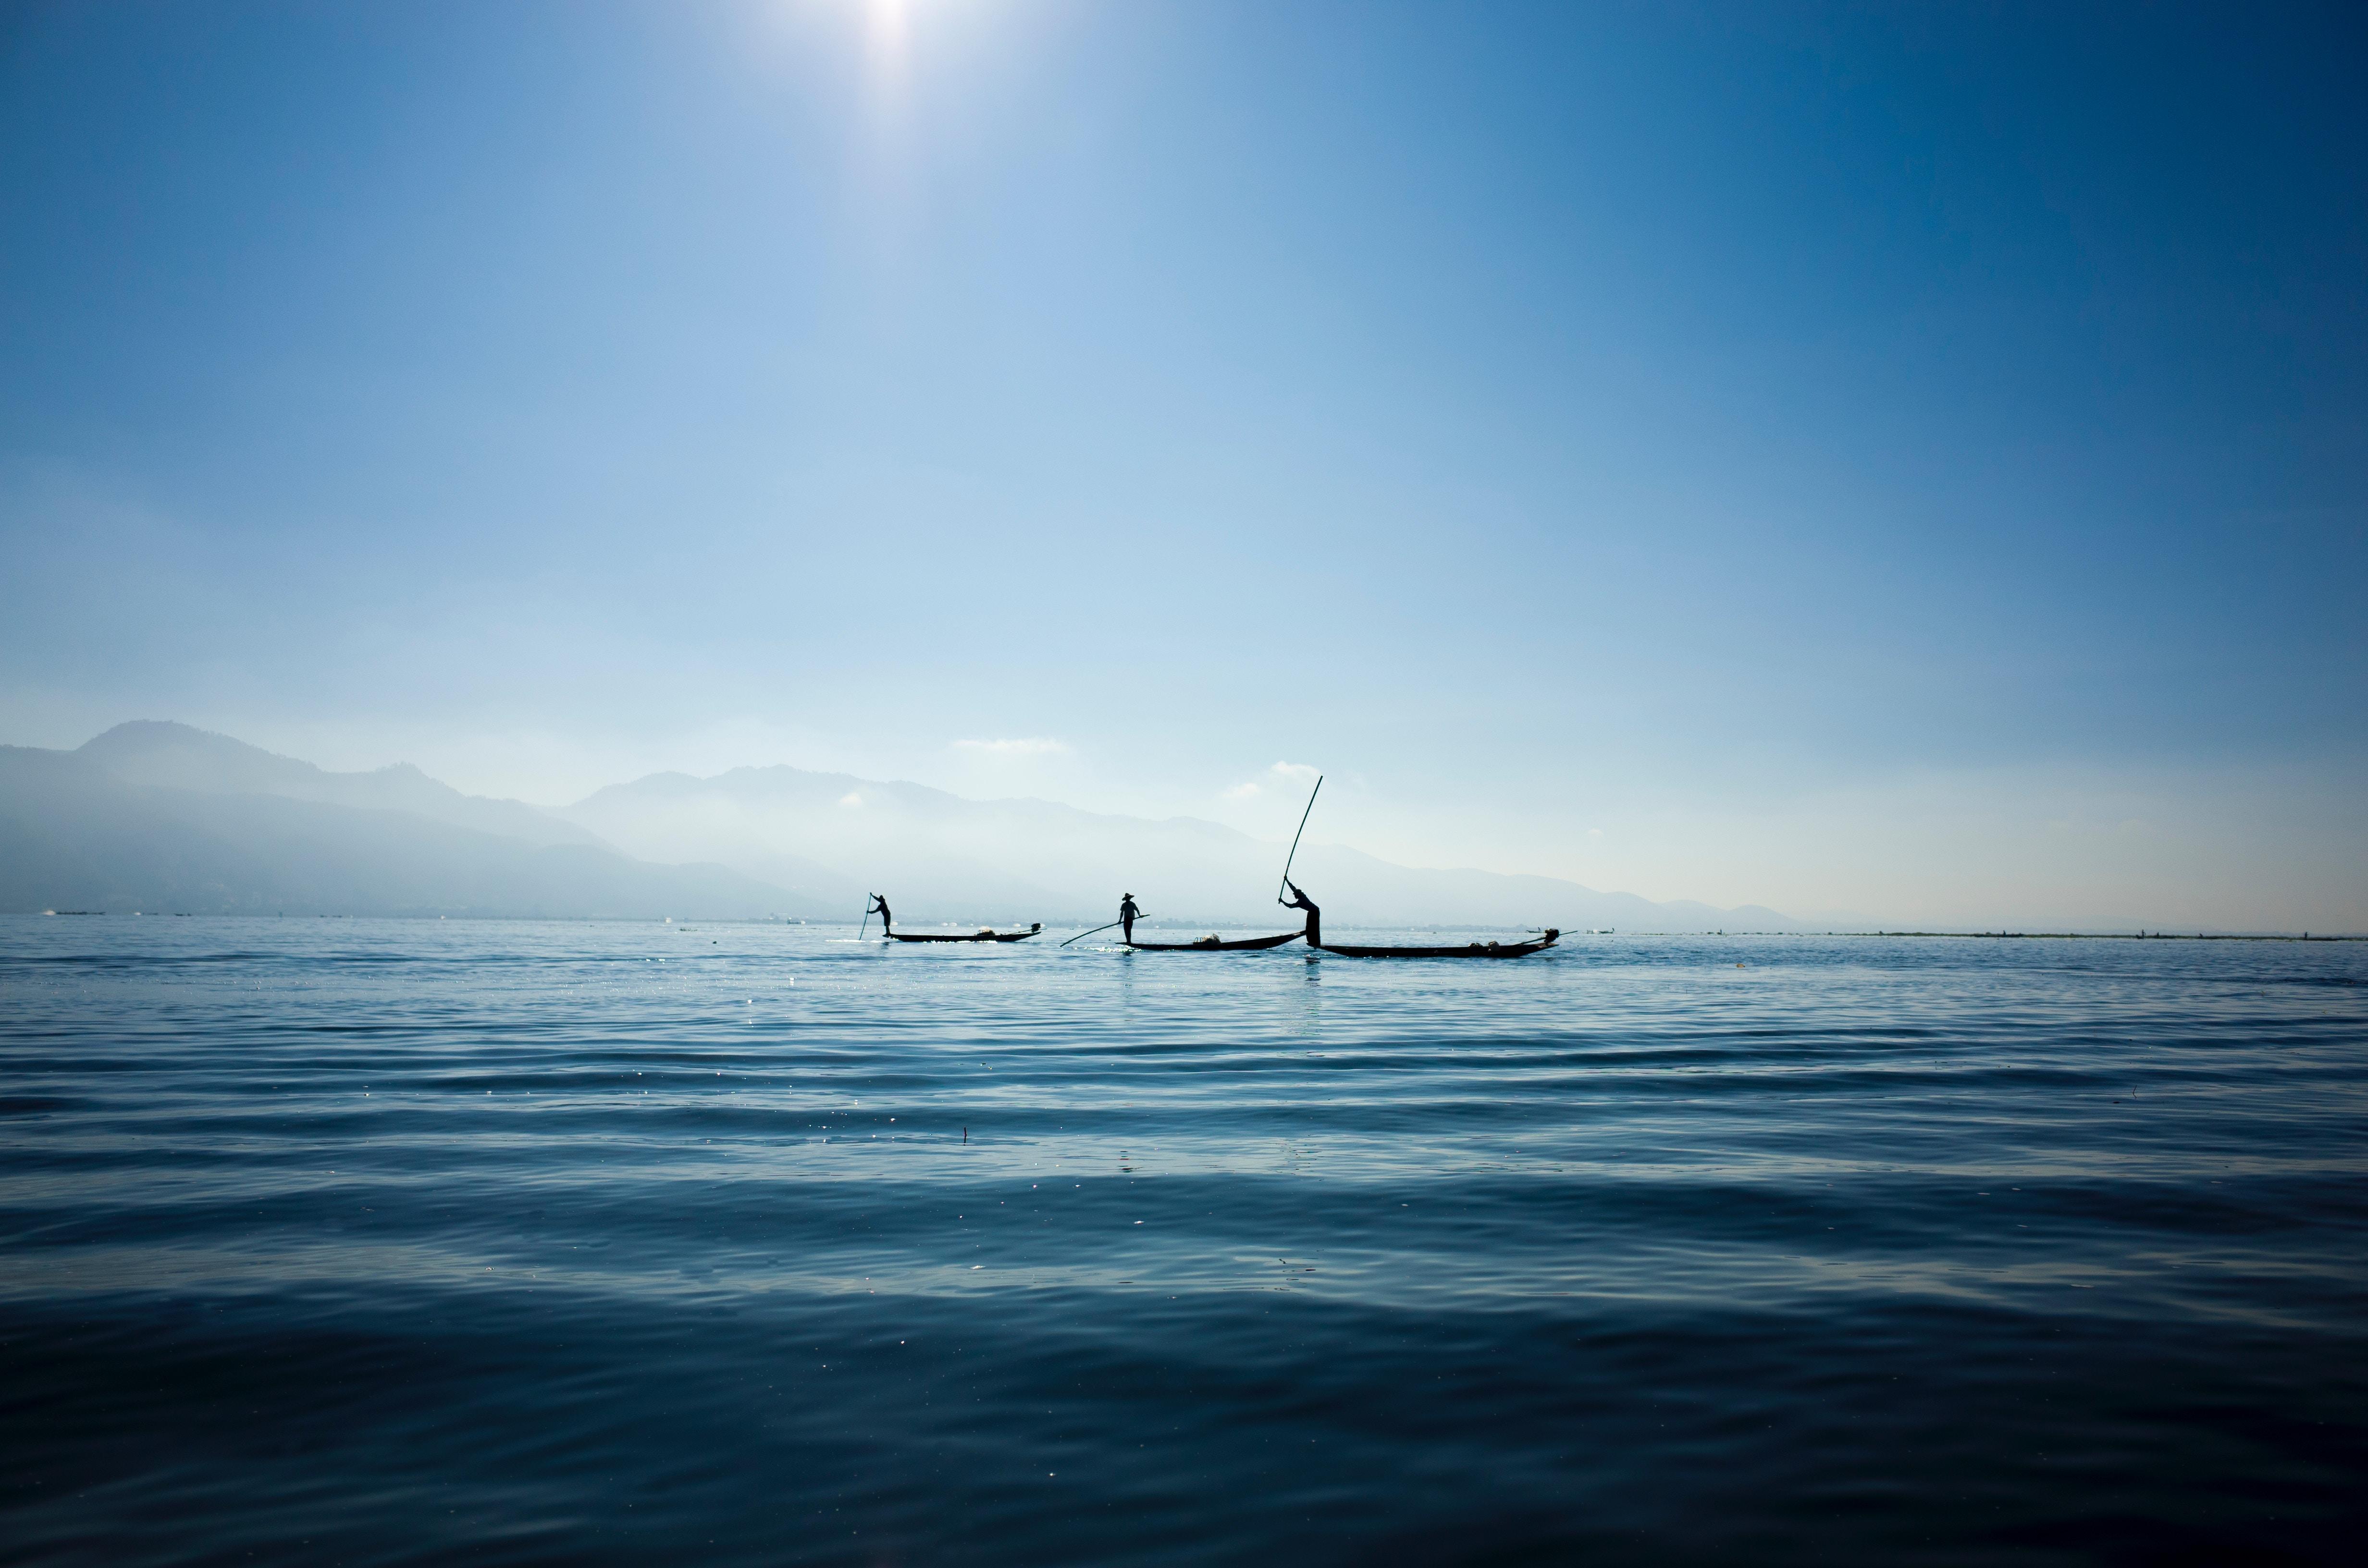 Croisière en Birmanie / Myanmar : au fil de l'Irrawaddy (de Bagan à Mandalay)